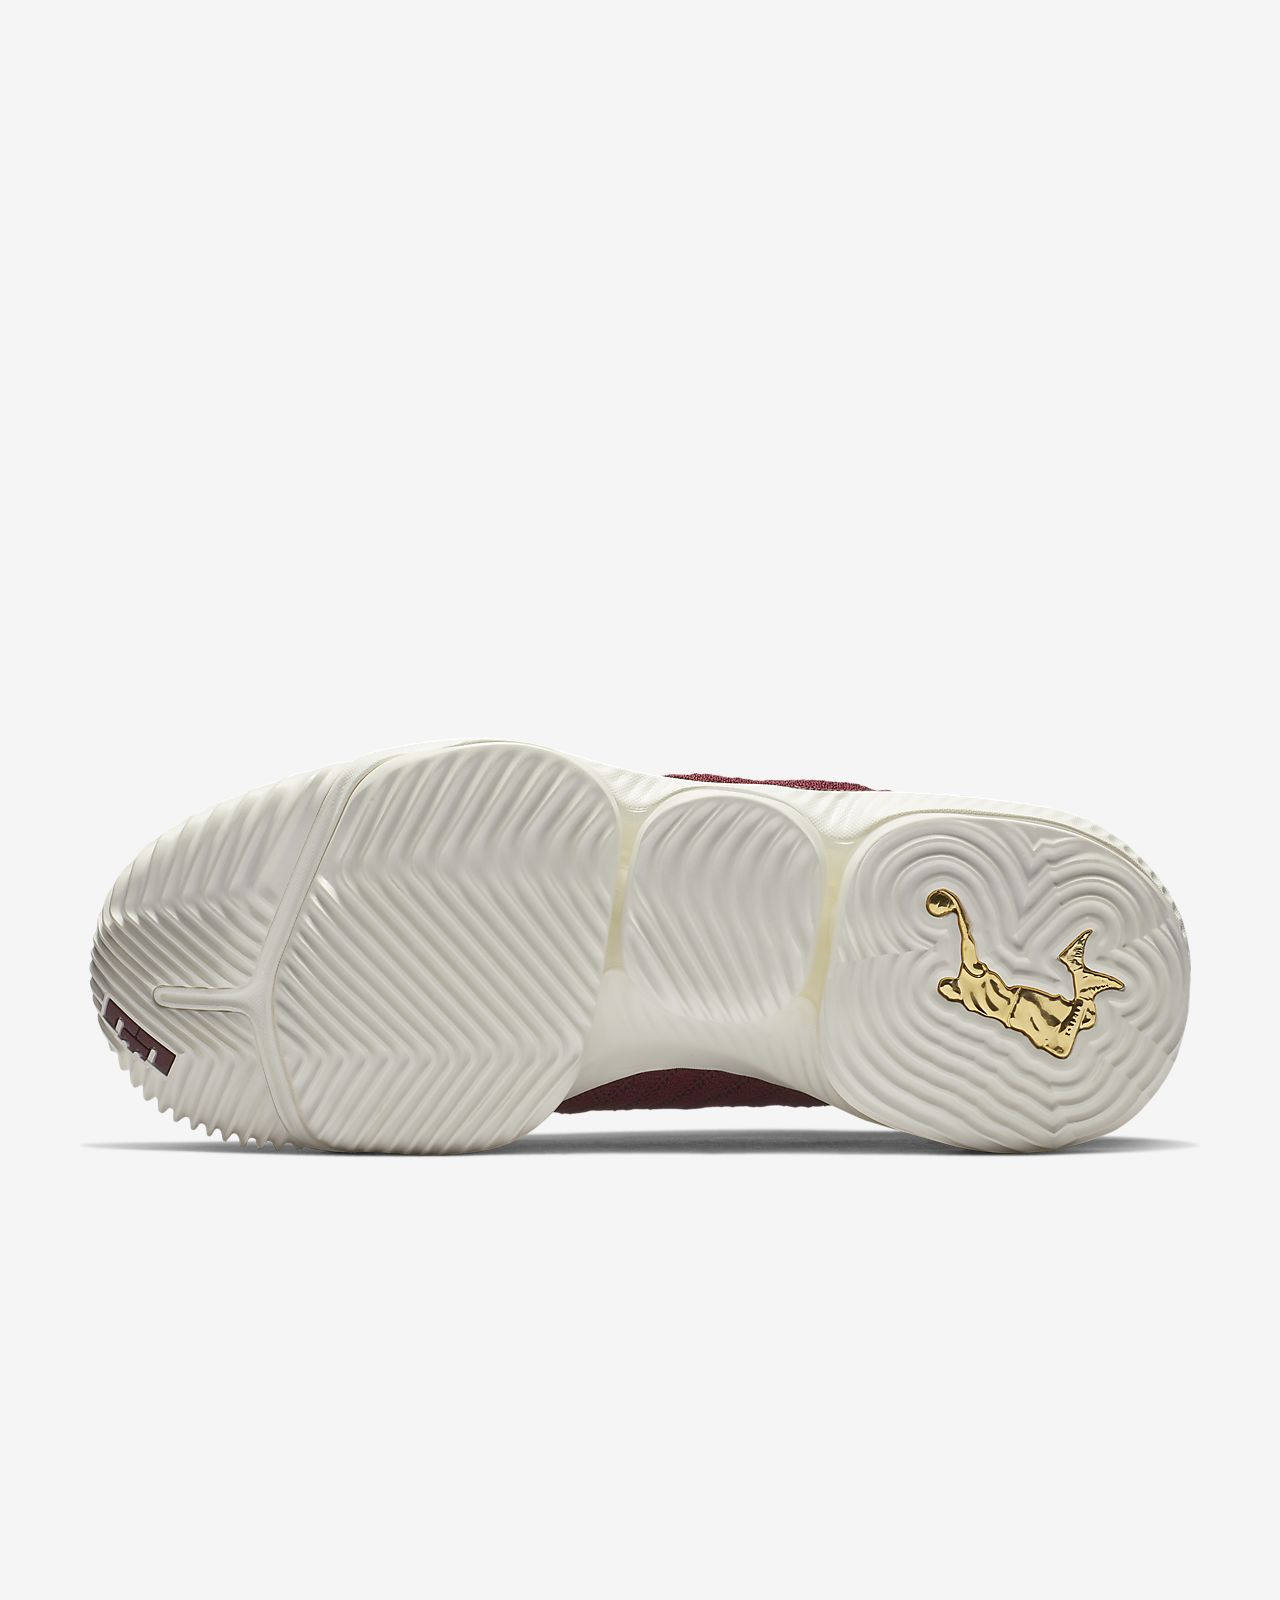 best website 37a55 a42c0 Low Resolution LeBron 16 Basketball Shoe LeBron 16 Basketball Shoe